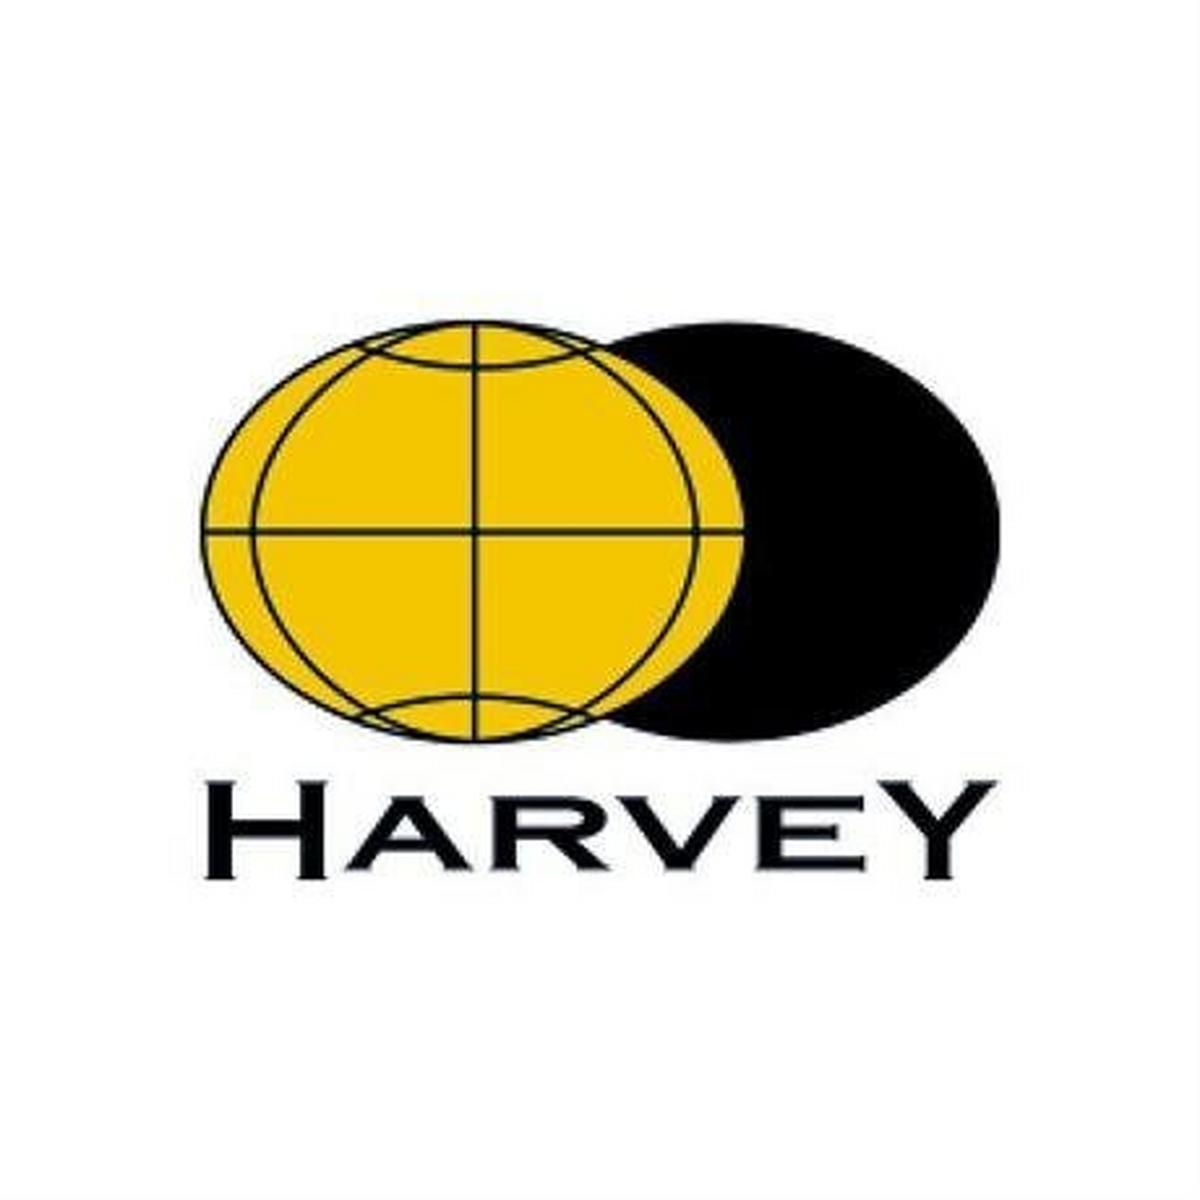 Harveys Harvey Map - XT40: Settle to Carlisle Way